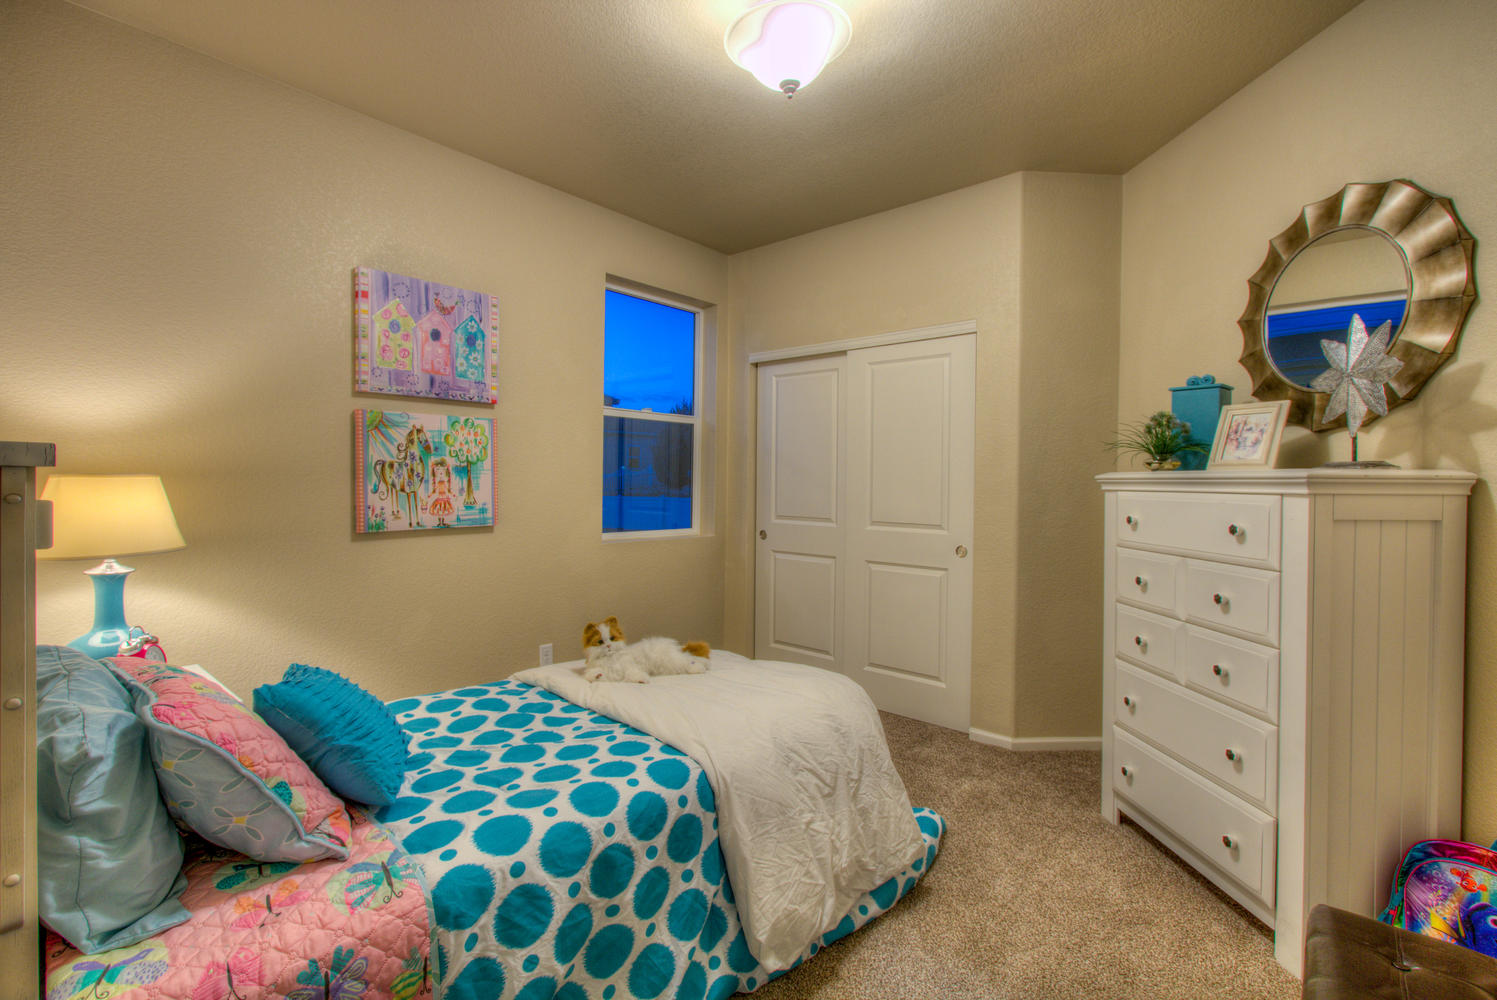 26_tabernash_fort_20collins_bedroom_203_new_20houses_20for_20sale